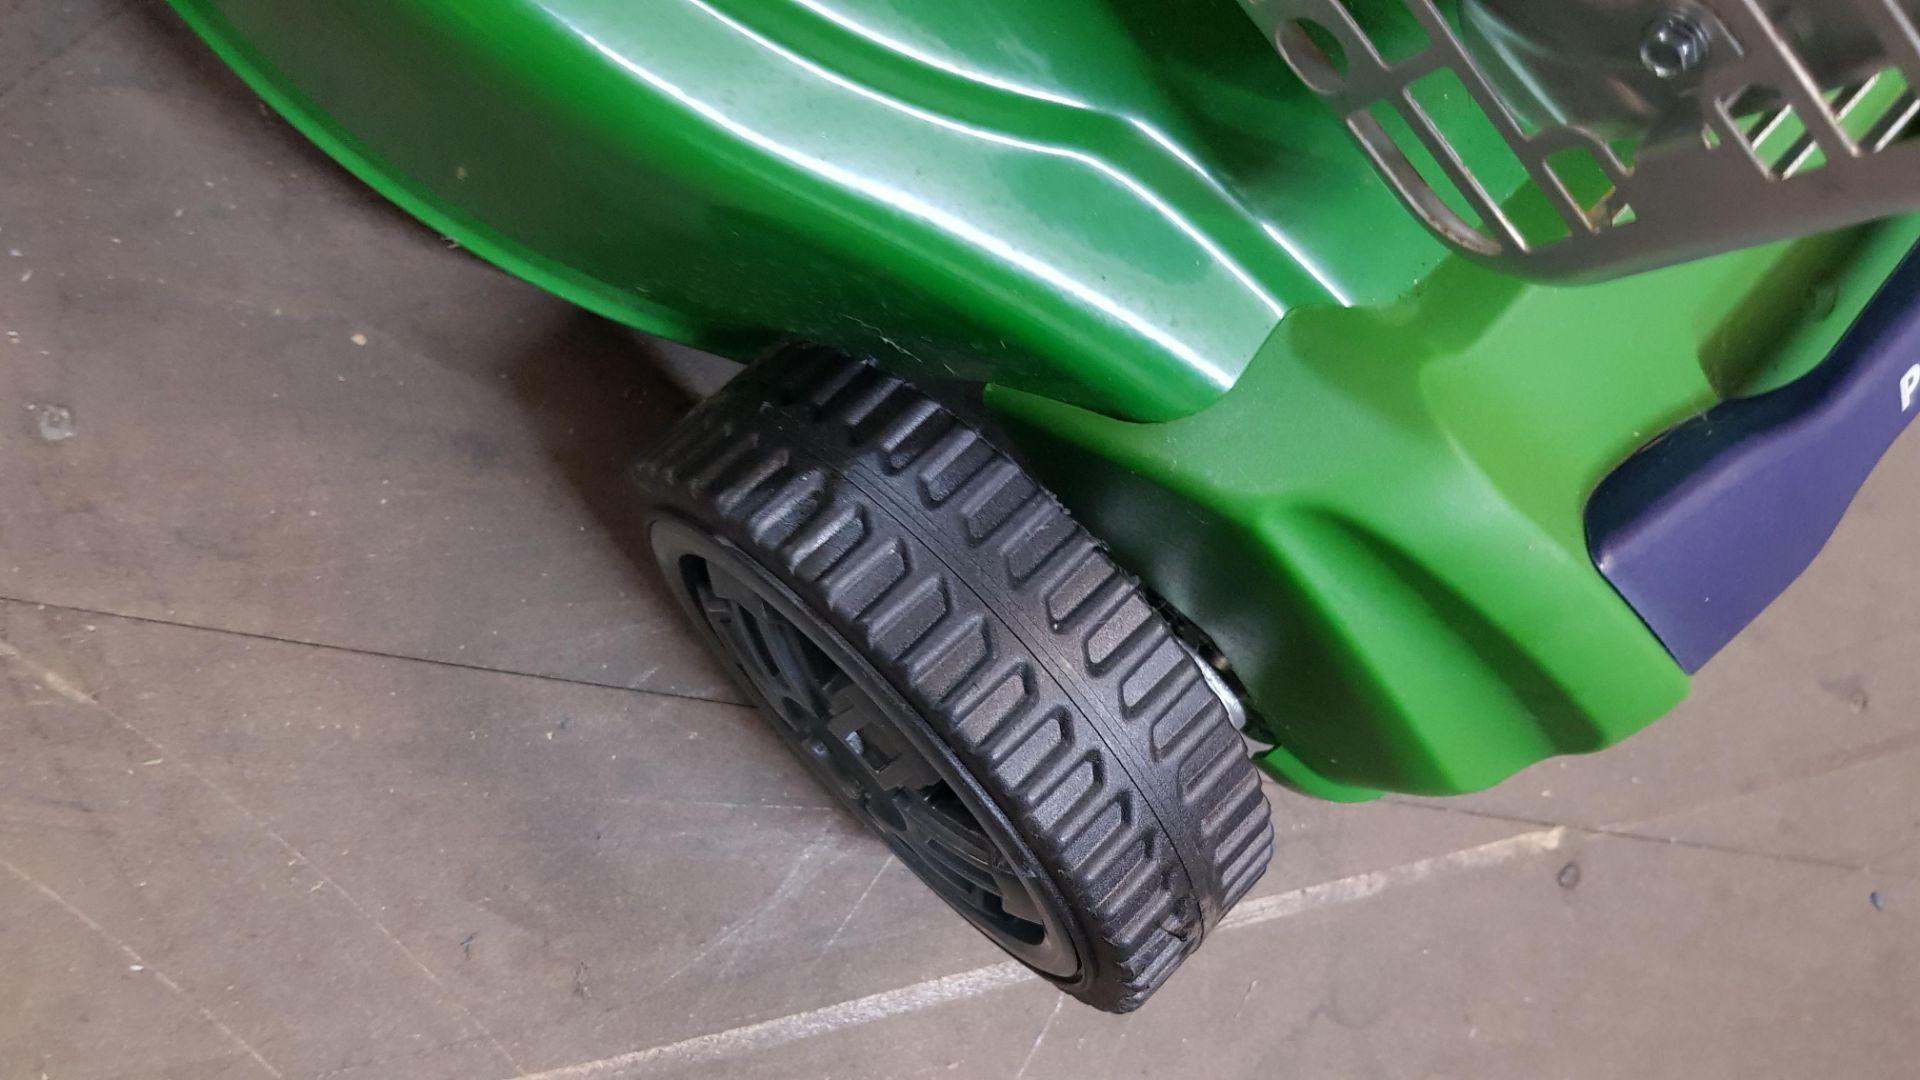 (P10) 1x Powerbase 41cm 125cc Push Petrol Rotary Lawn Mower (XSS41D) RRP £199. New, Clean Unused I - Image 6 of 8